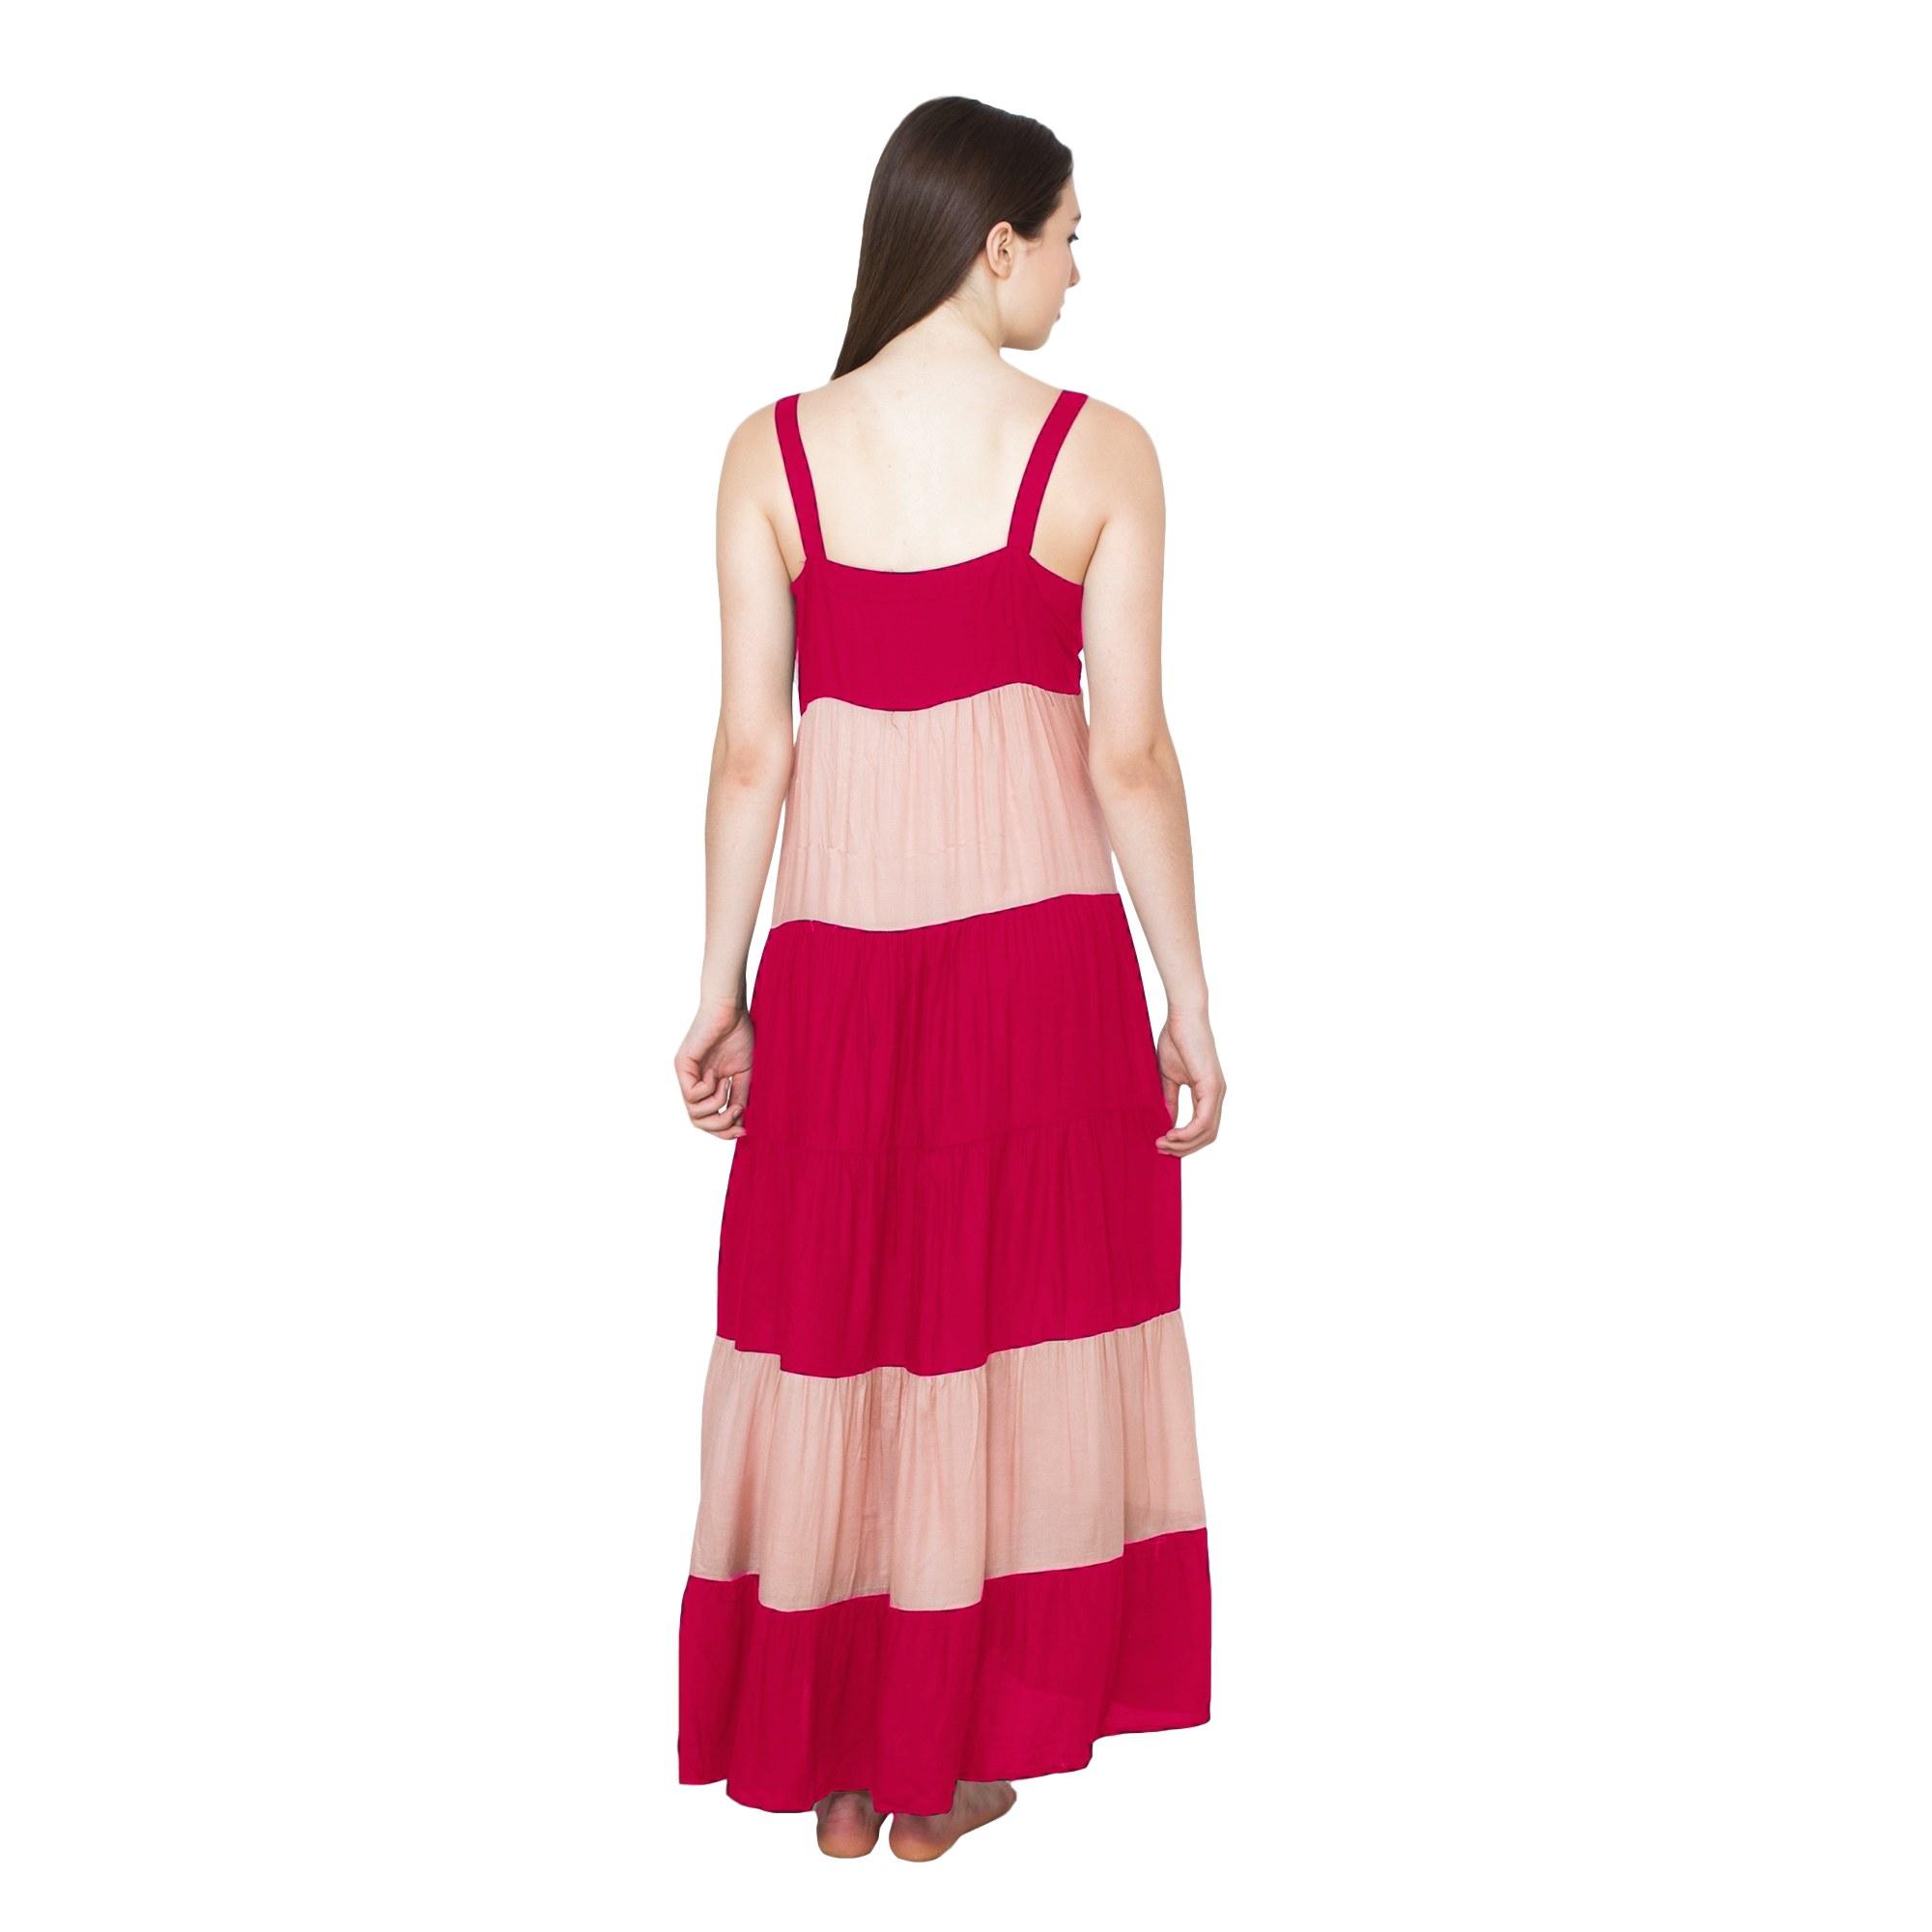 Spaghetti Strap Pleated Frilled Nighty Dress Gown in Fuchsia:Peach